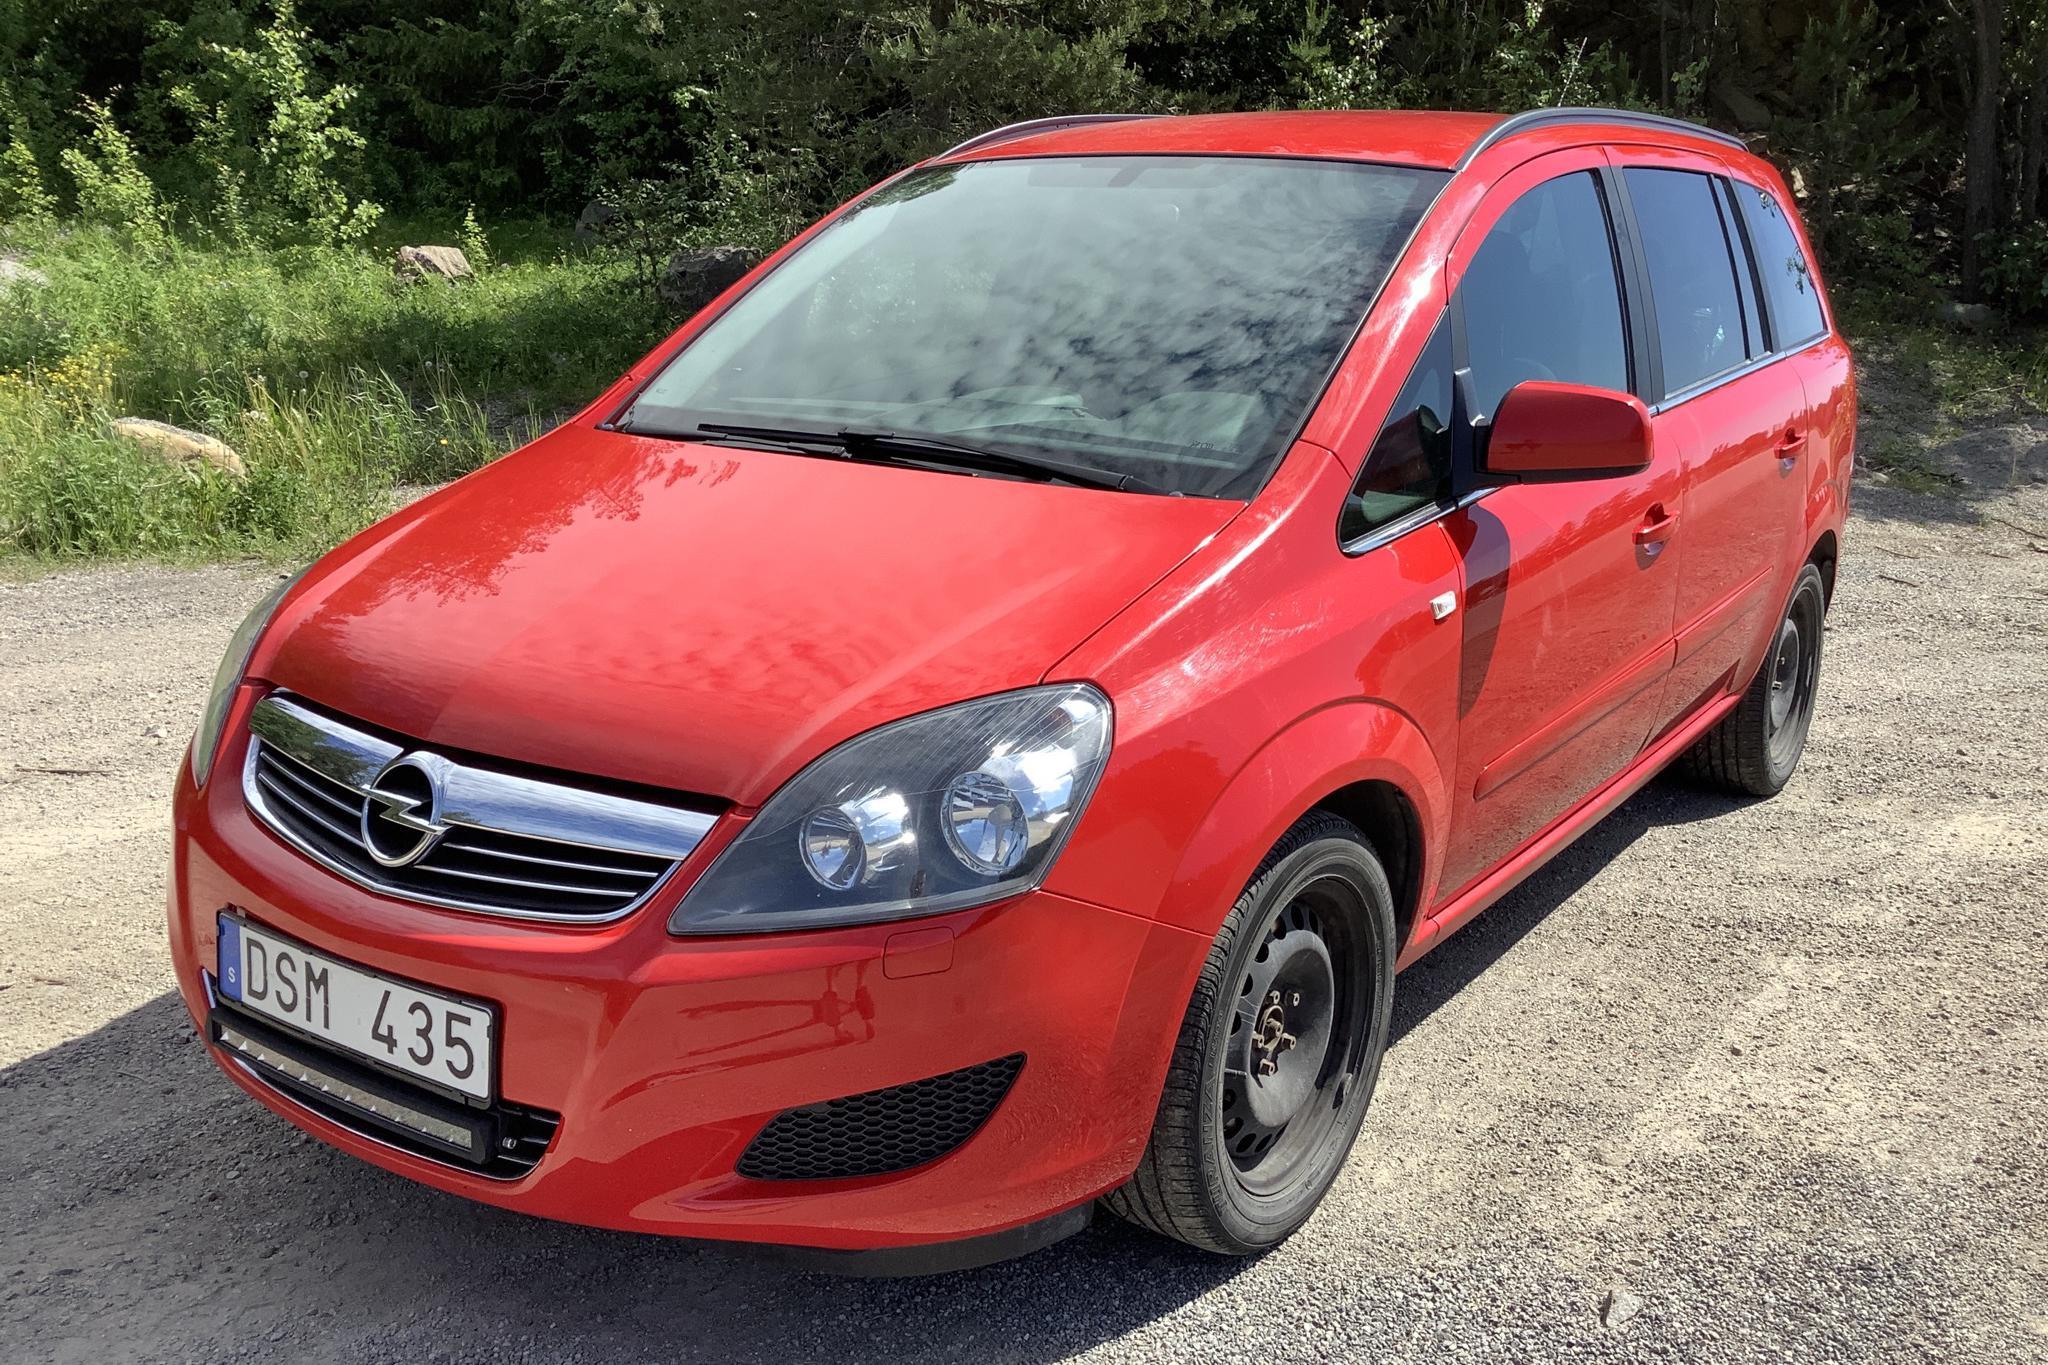 Opel Zafira II 1.6 CNG Turbo ecoFLEX (150hk)